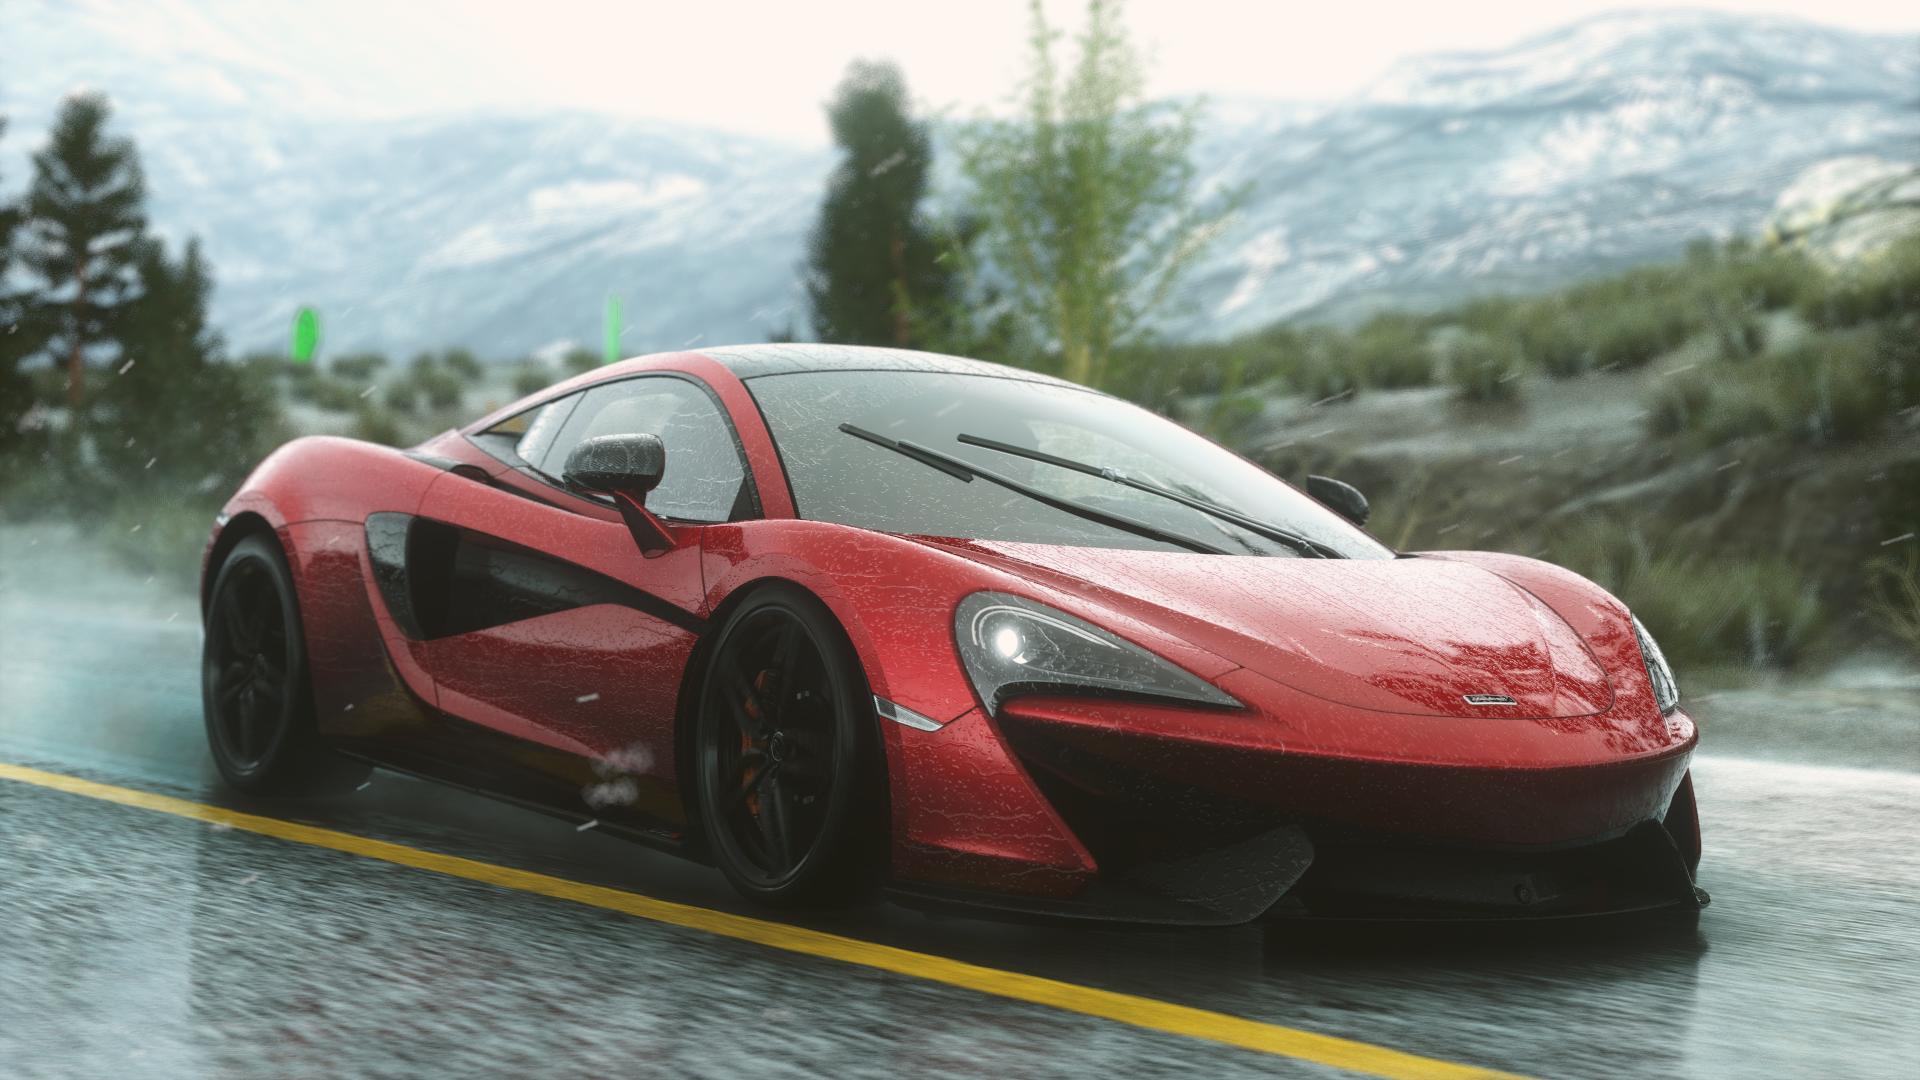 Wallpaper : video games, race cars, sports car, McLaren MP4 12C ...